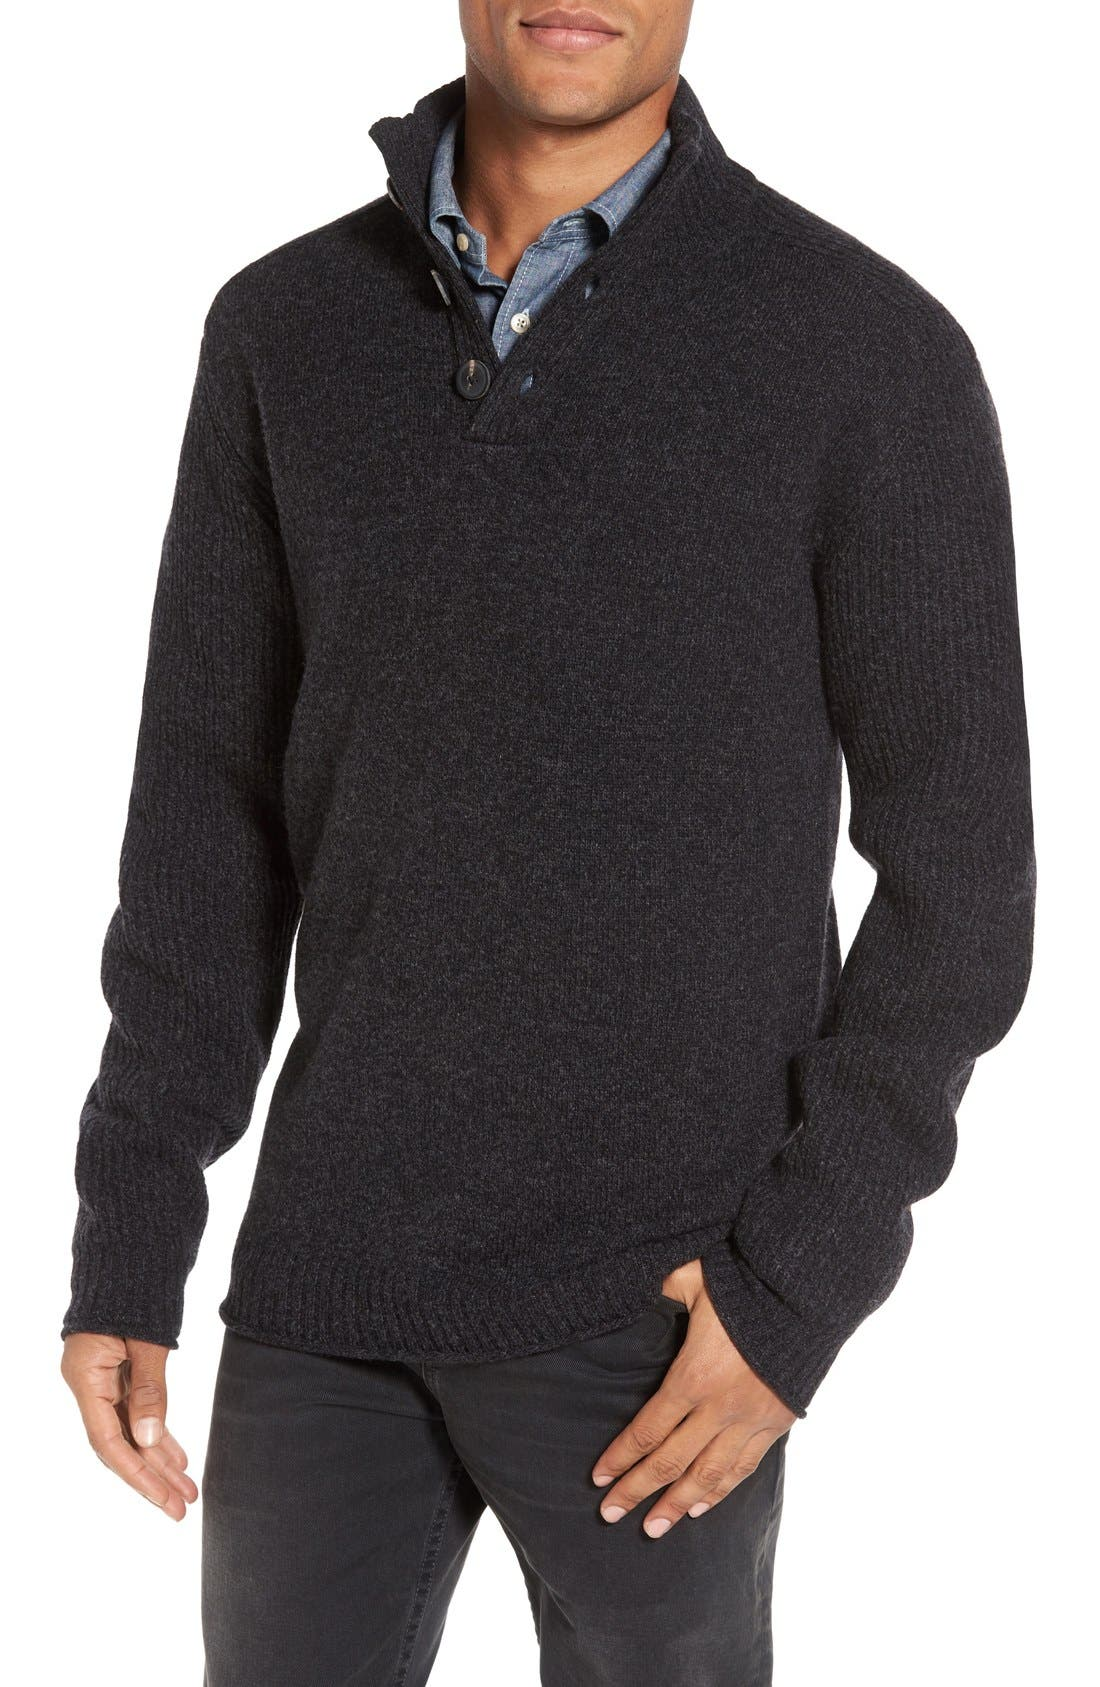 Birkenhead Mock Neck Sweater,                             Main thumbnail 1, color,                             021